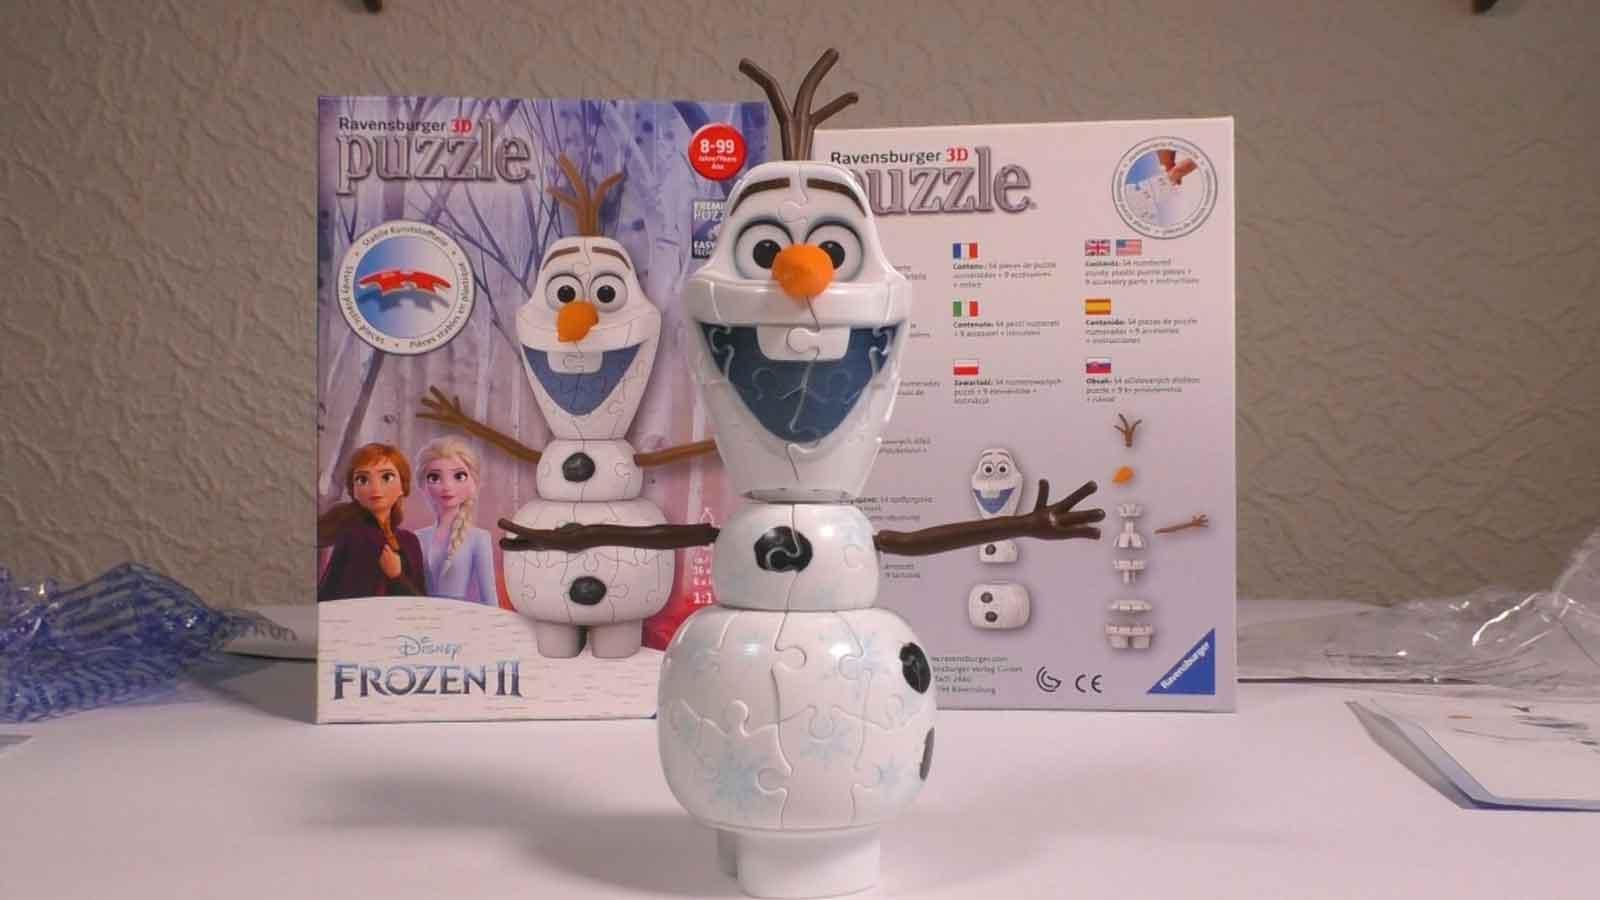 Ravensburger 3D Puzzle Olaf fertig gepuzzelt